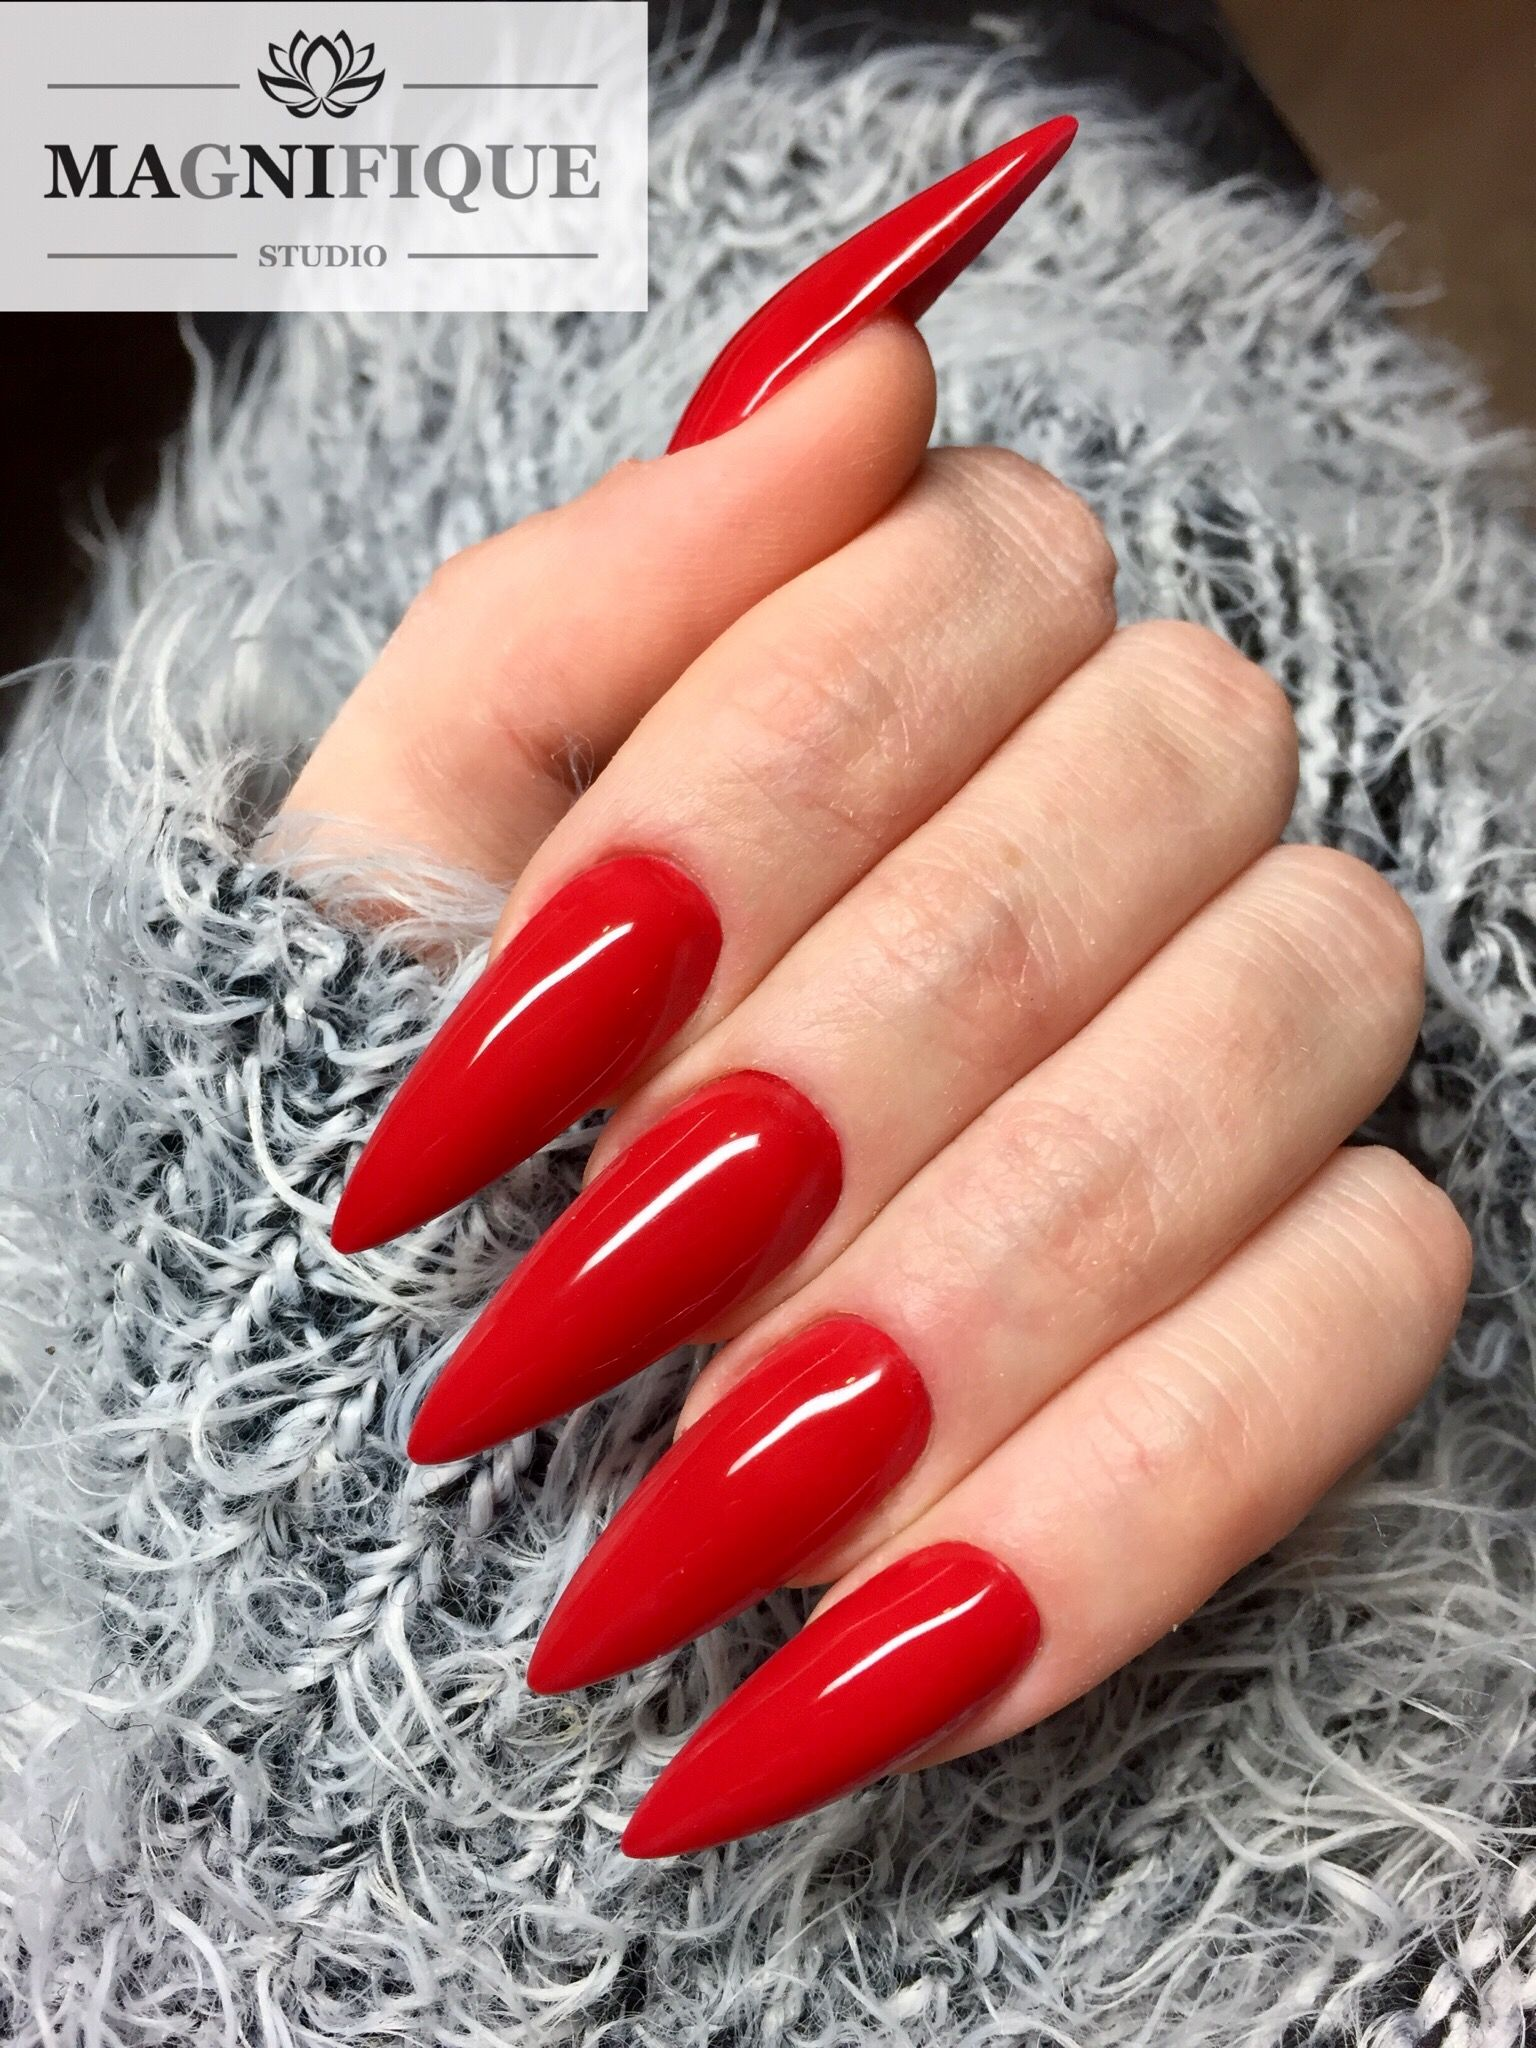 Red Nails Party Nails Rotenagel Czerwone Paznokcie Party Nails